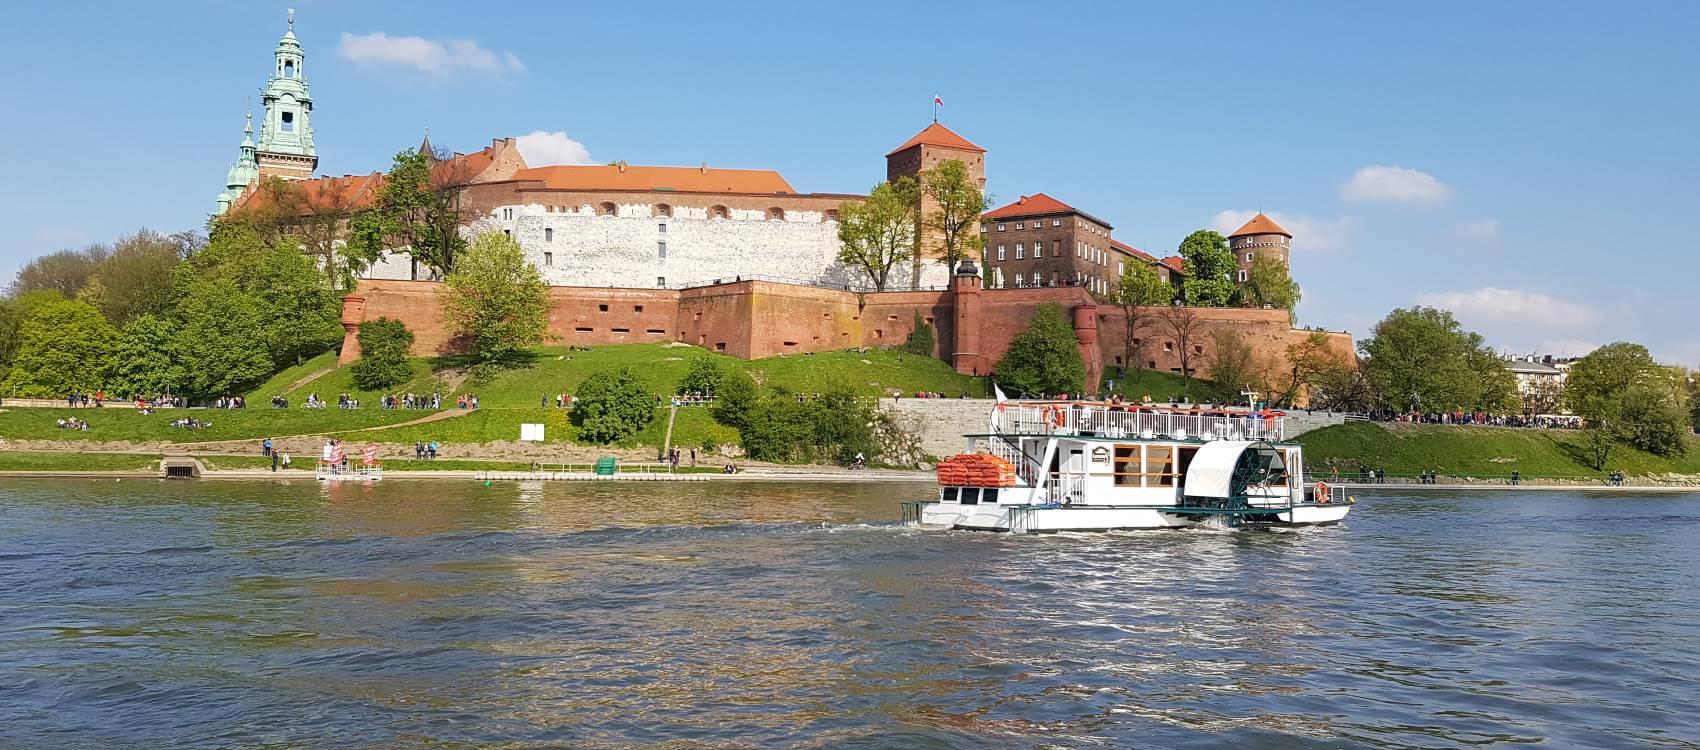 Cruises on the Vistula River in Krakow